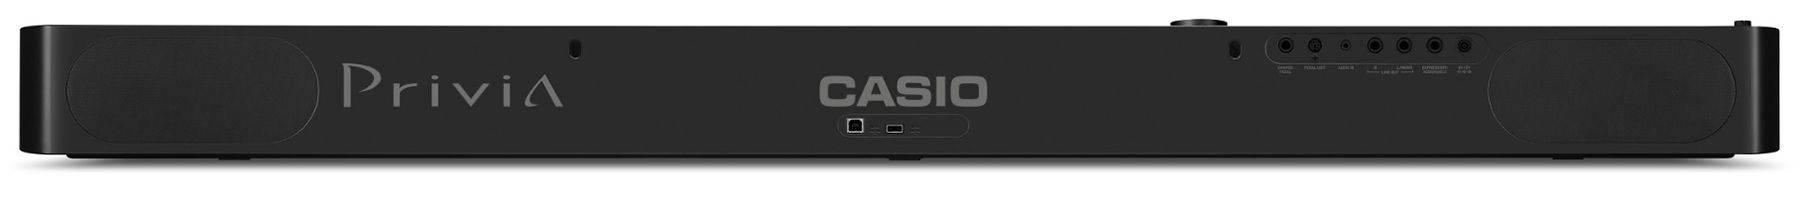 Casio PX-S3000BK Black 88 Key 700 Tones 200 Rhythms Digital Piano Product Image 5